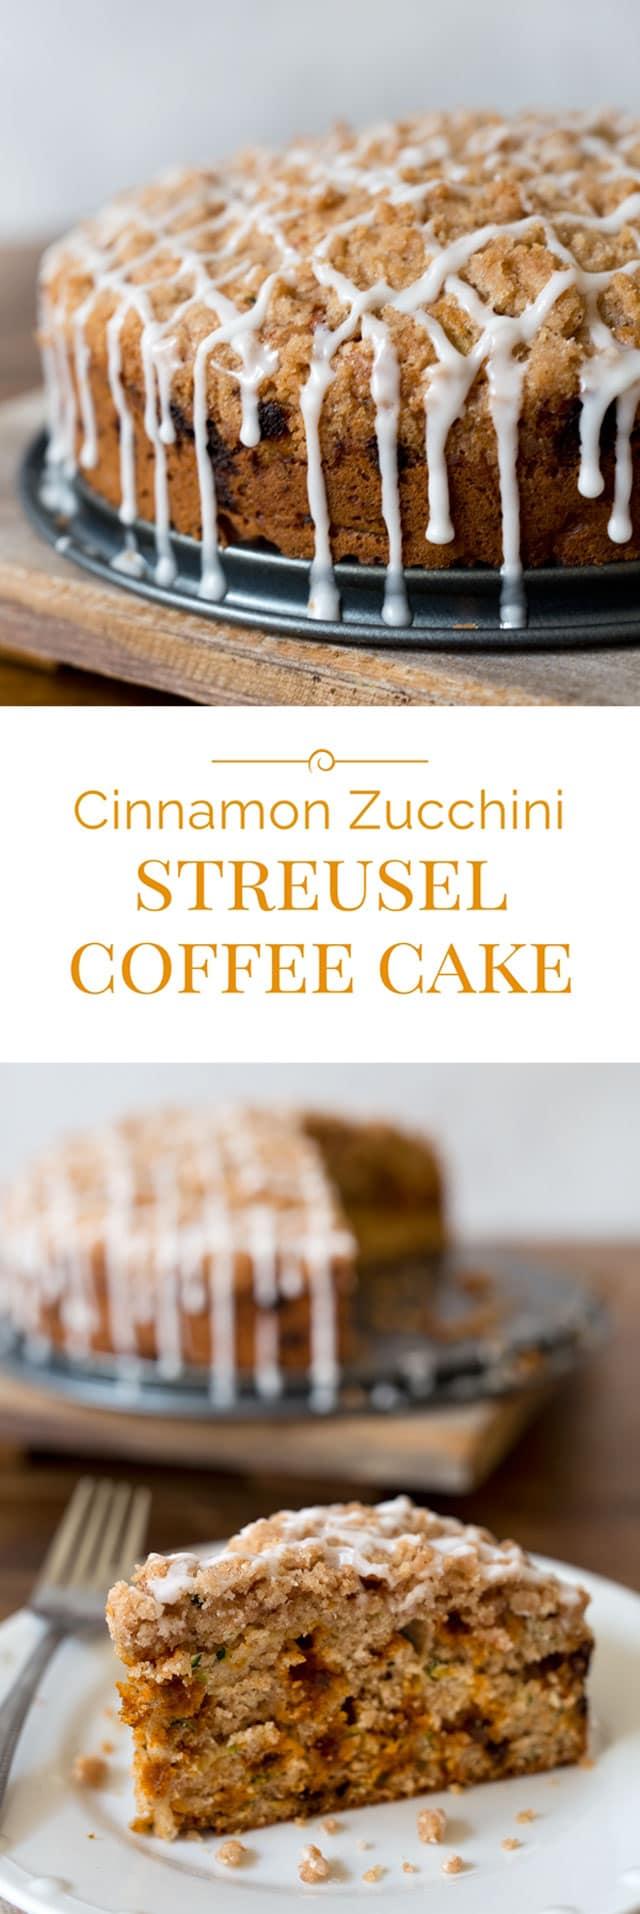 Cinnamon-Zucchini-Streusel-Coffee-Cake-Collage-Barbara-Bakes